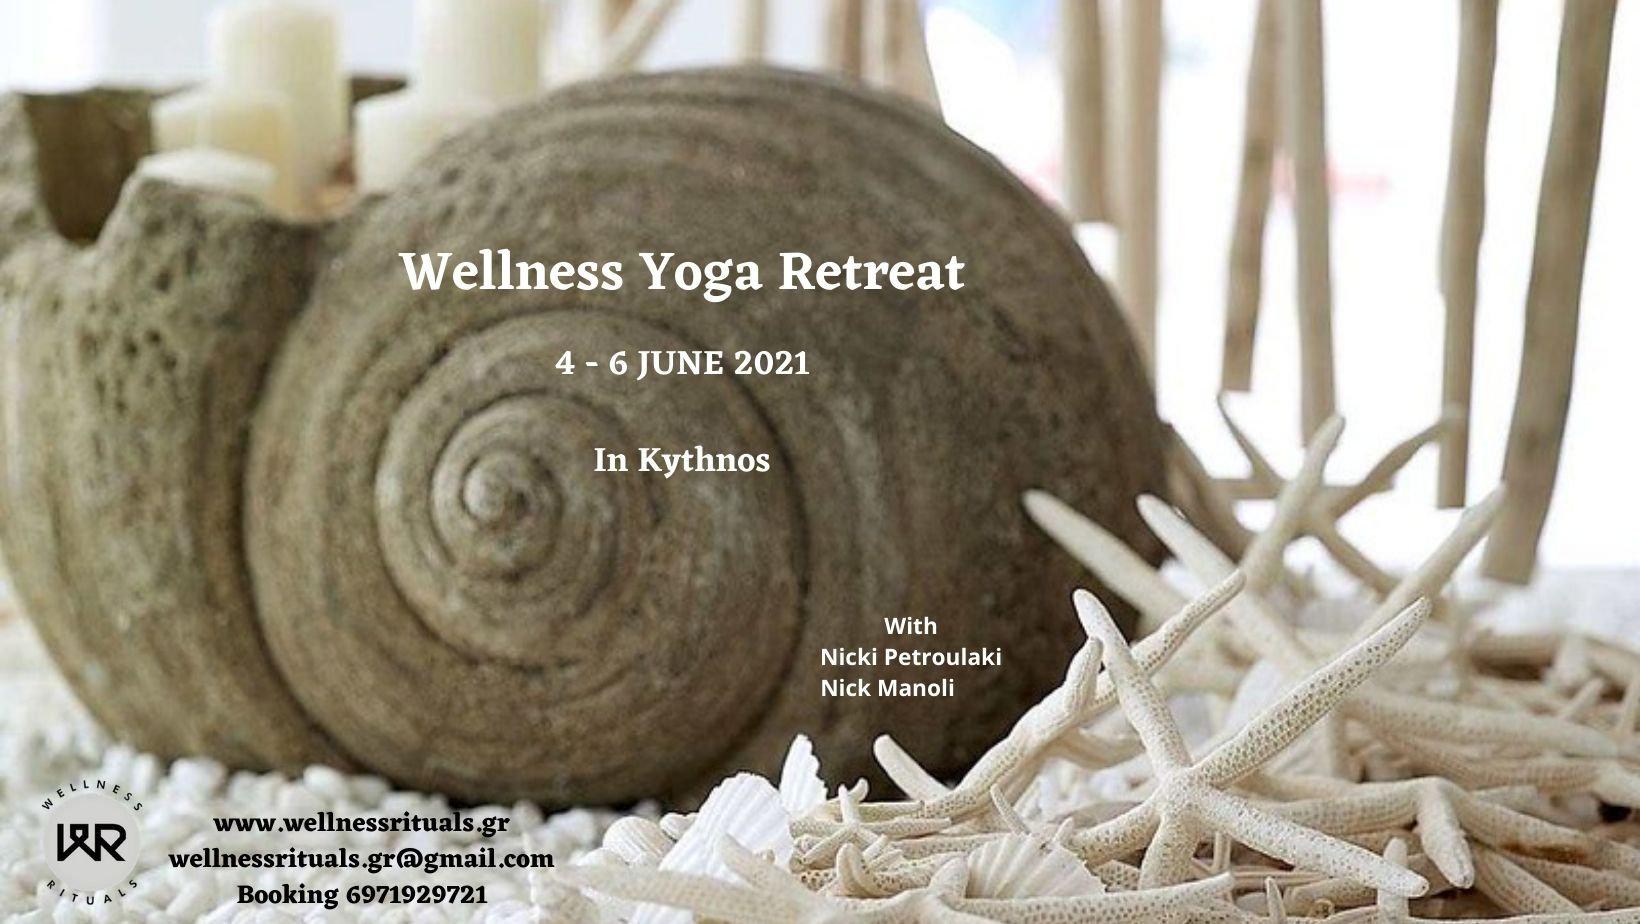 Wellness Yoga Retreat